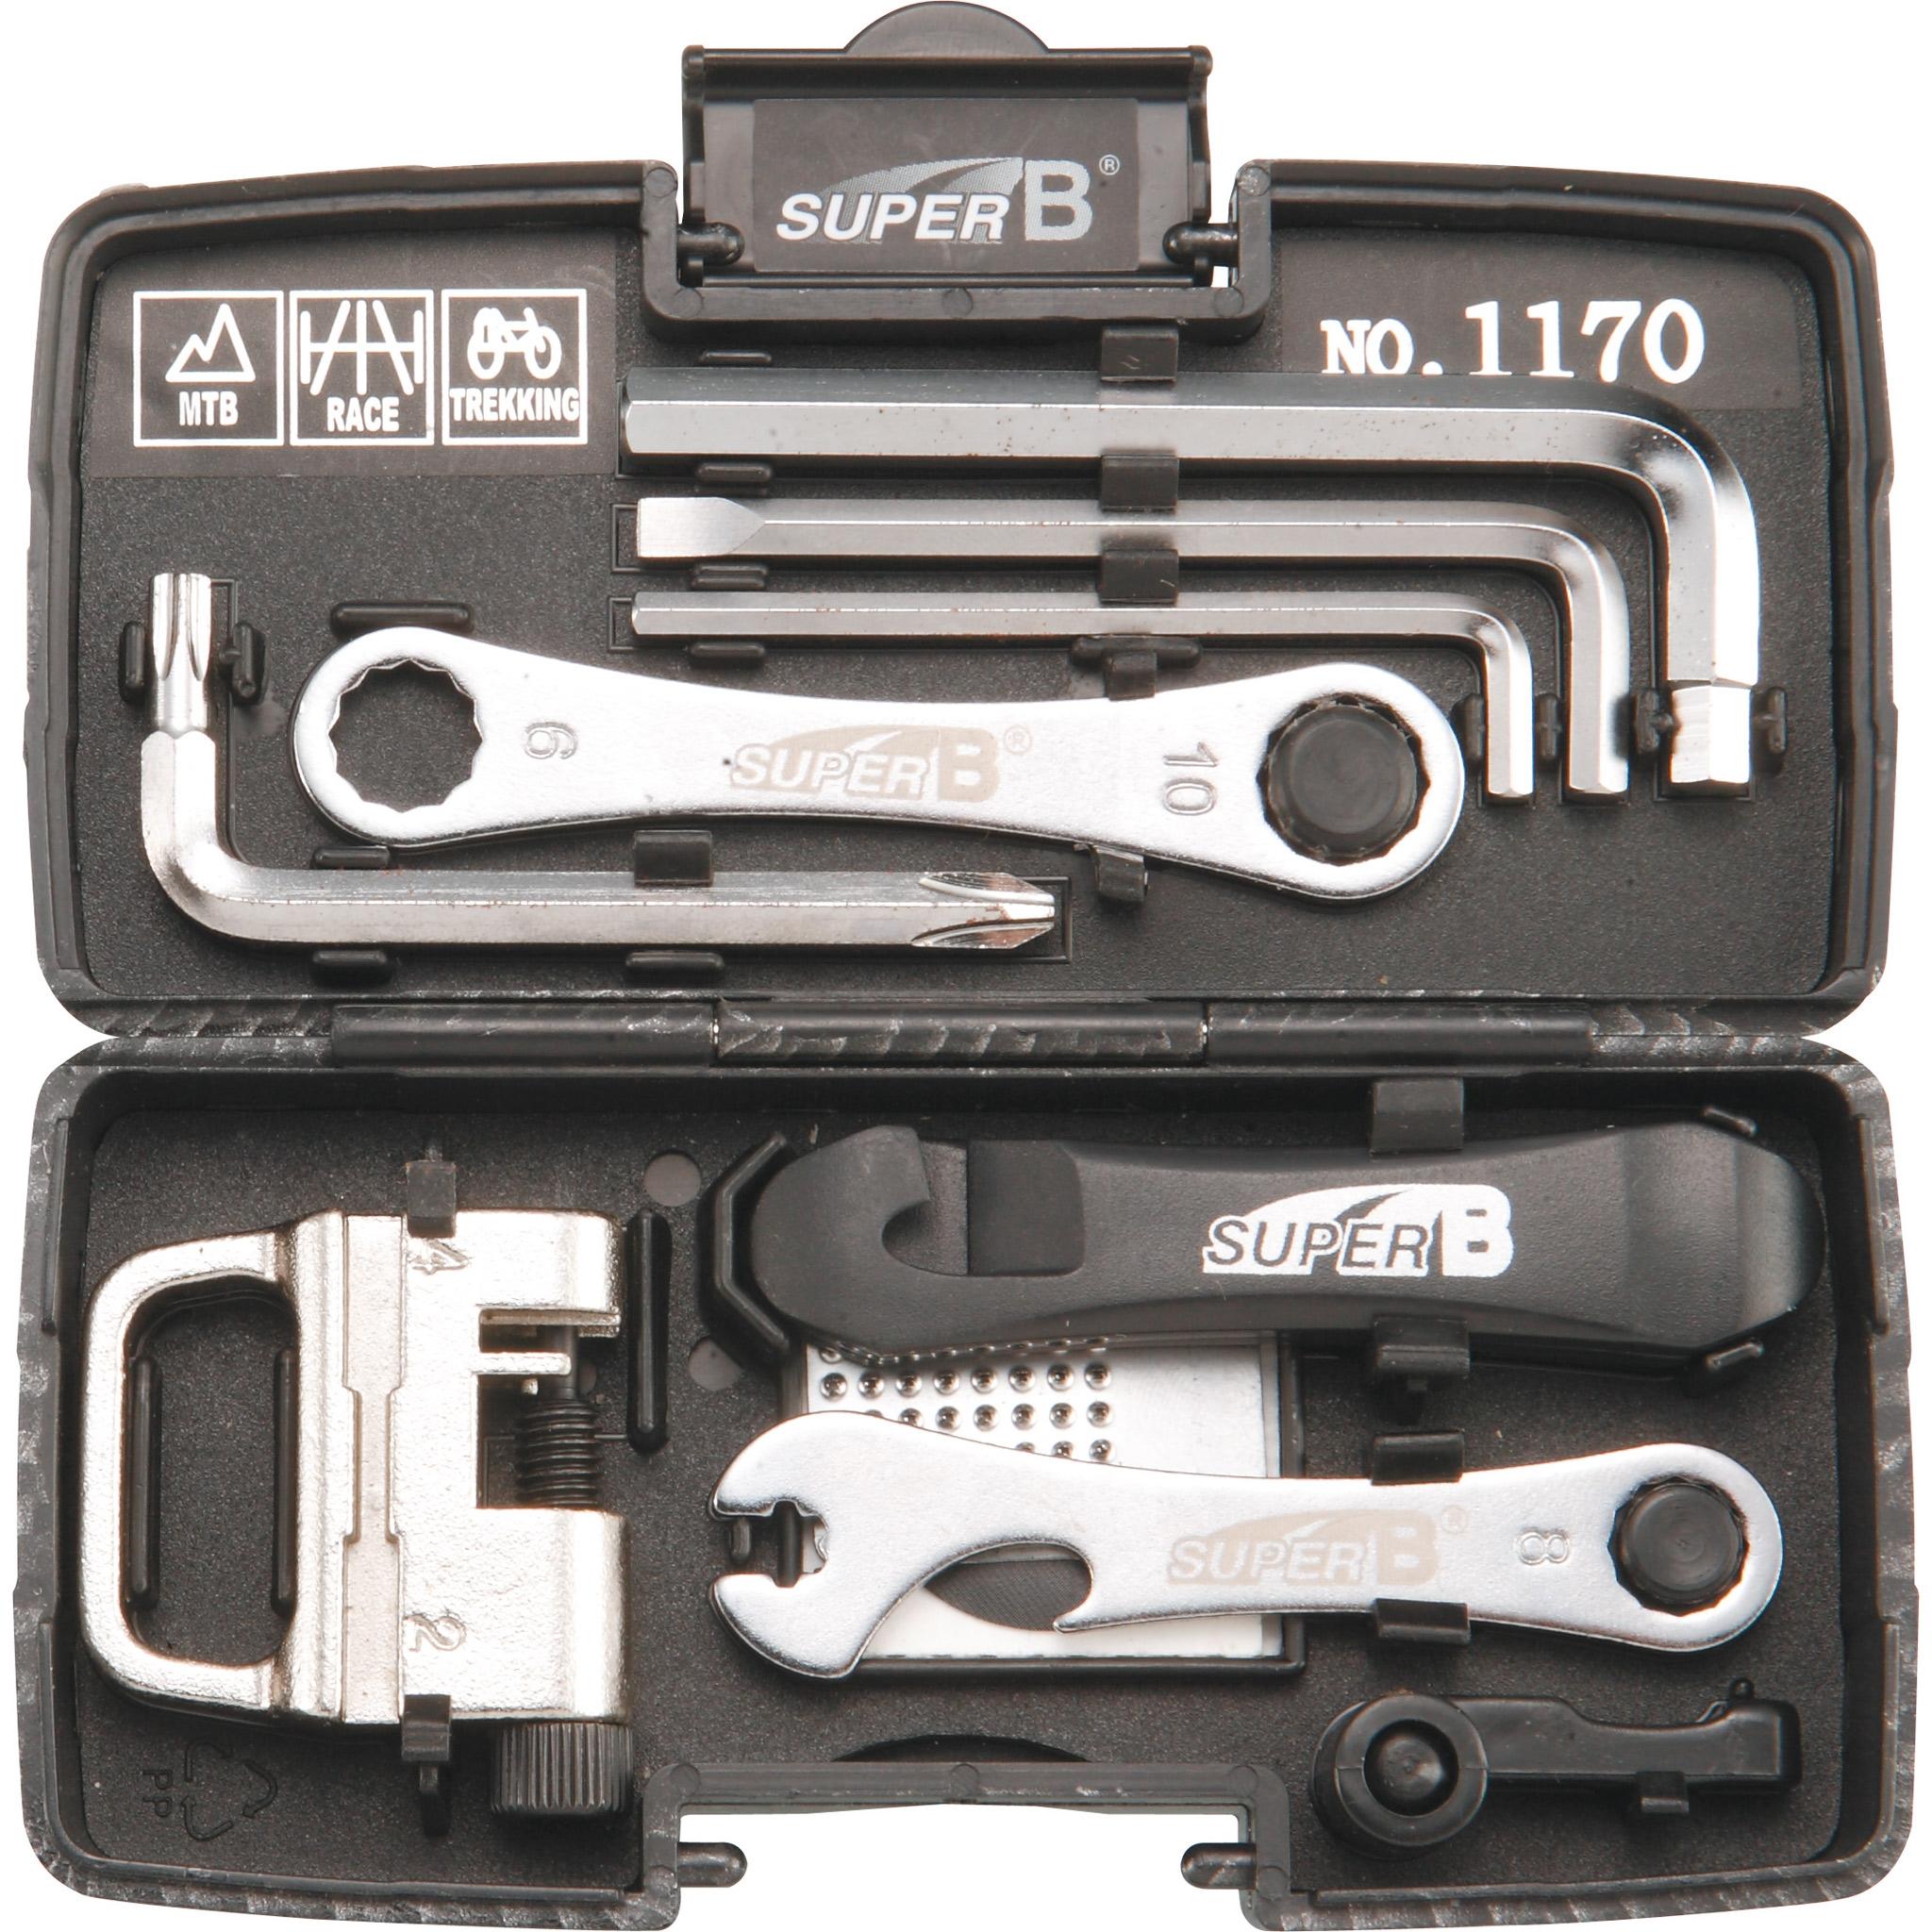 Conjunto de ferramentas SUPER B PROFESSIONNAL 15 Peças Probikeshop #756256 2048x2048